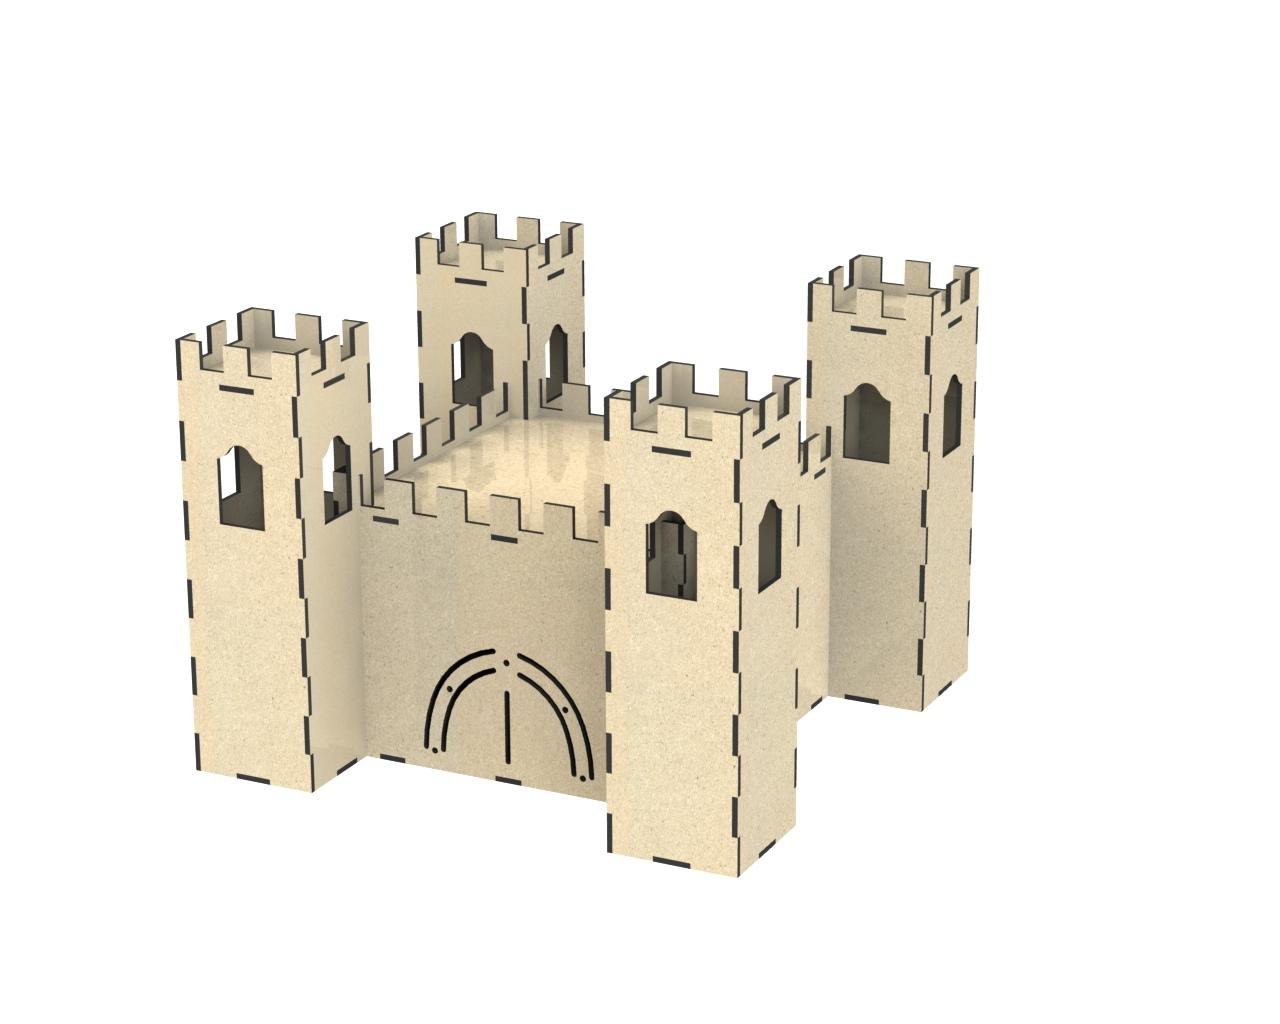 Castle Dollhouse Free DXF File